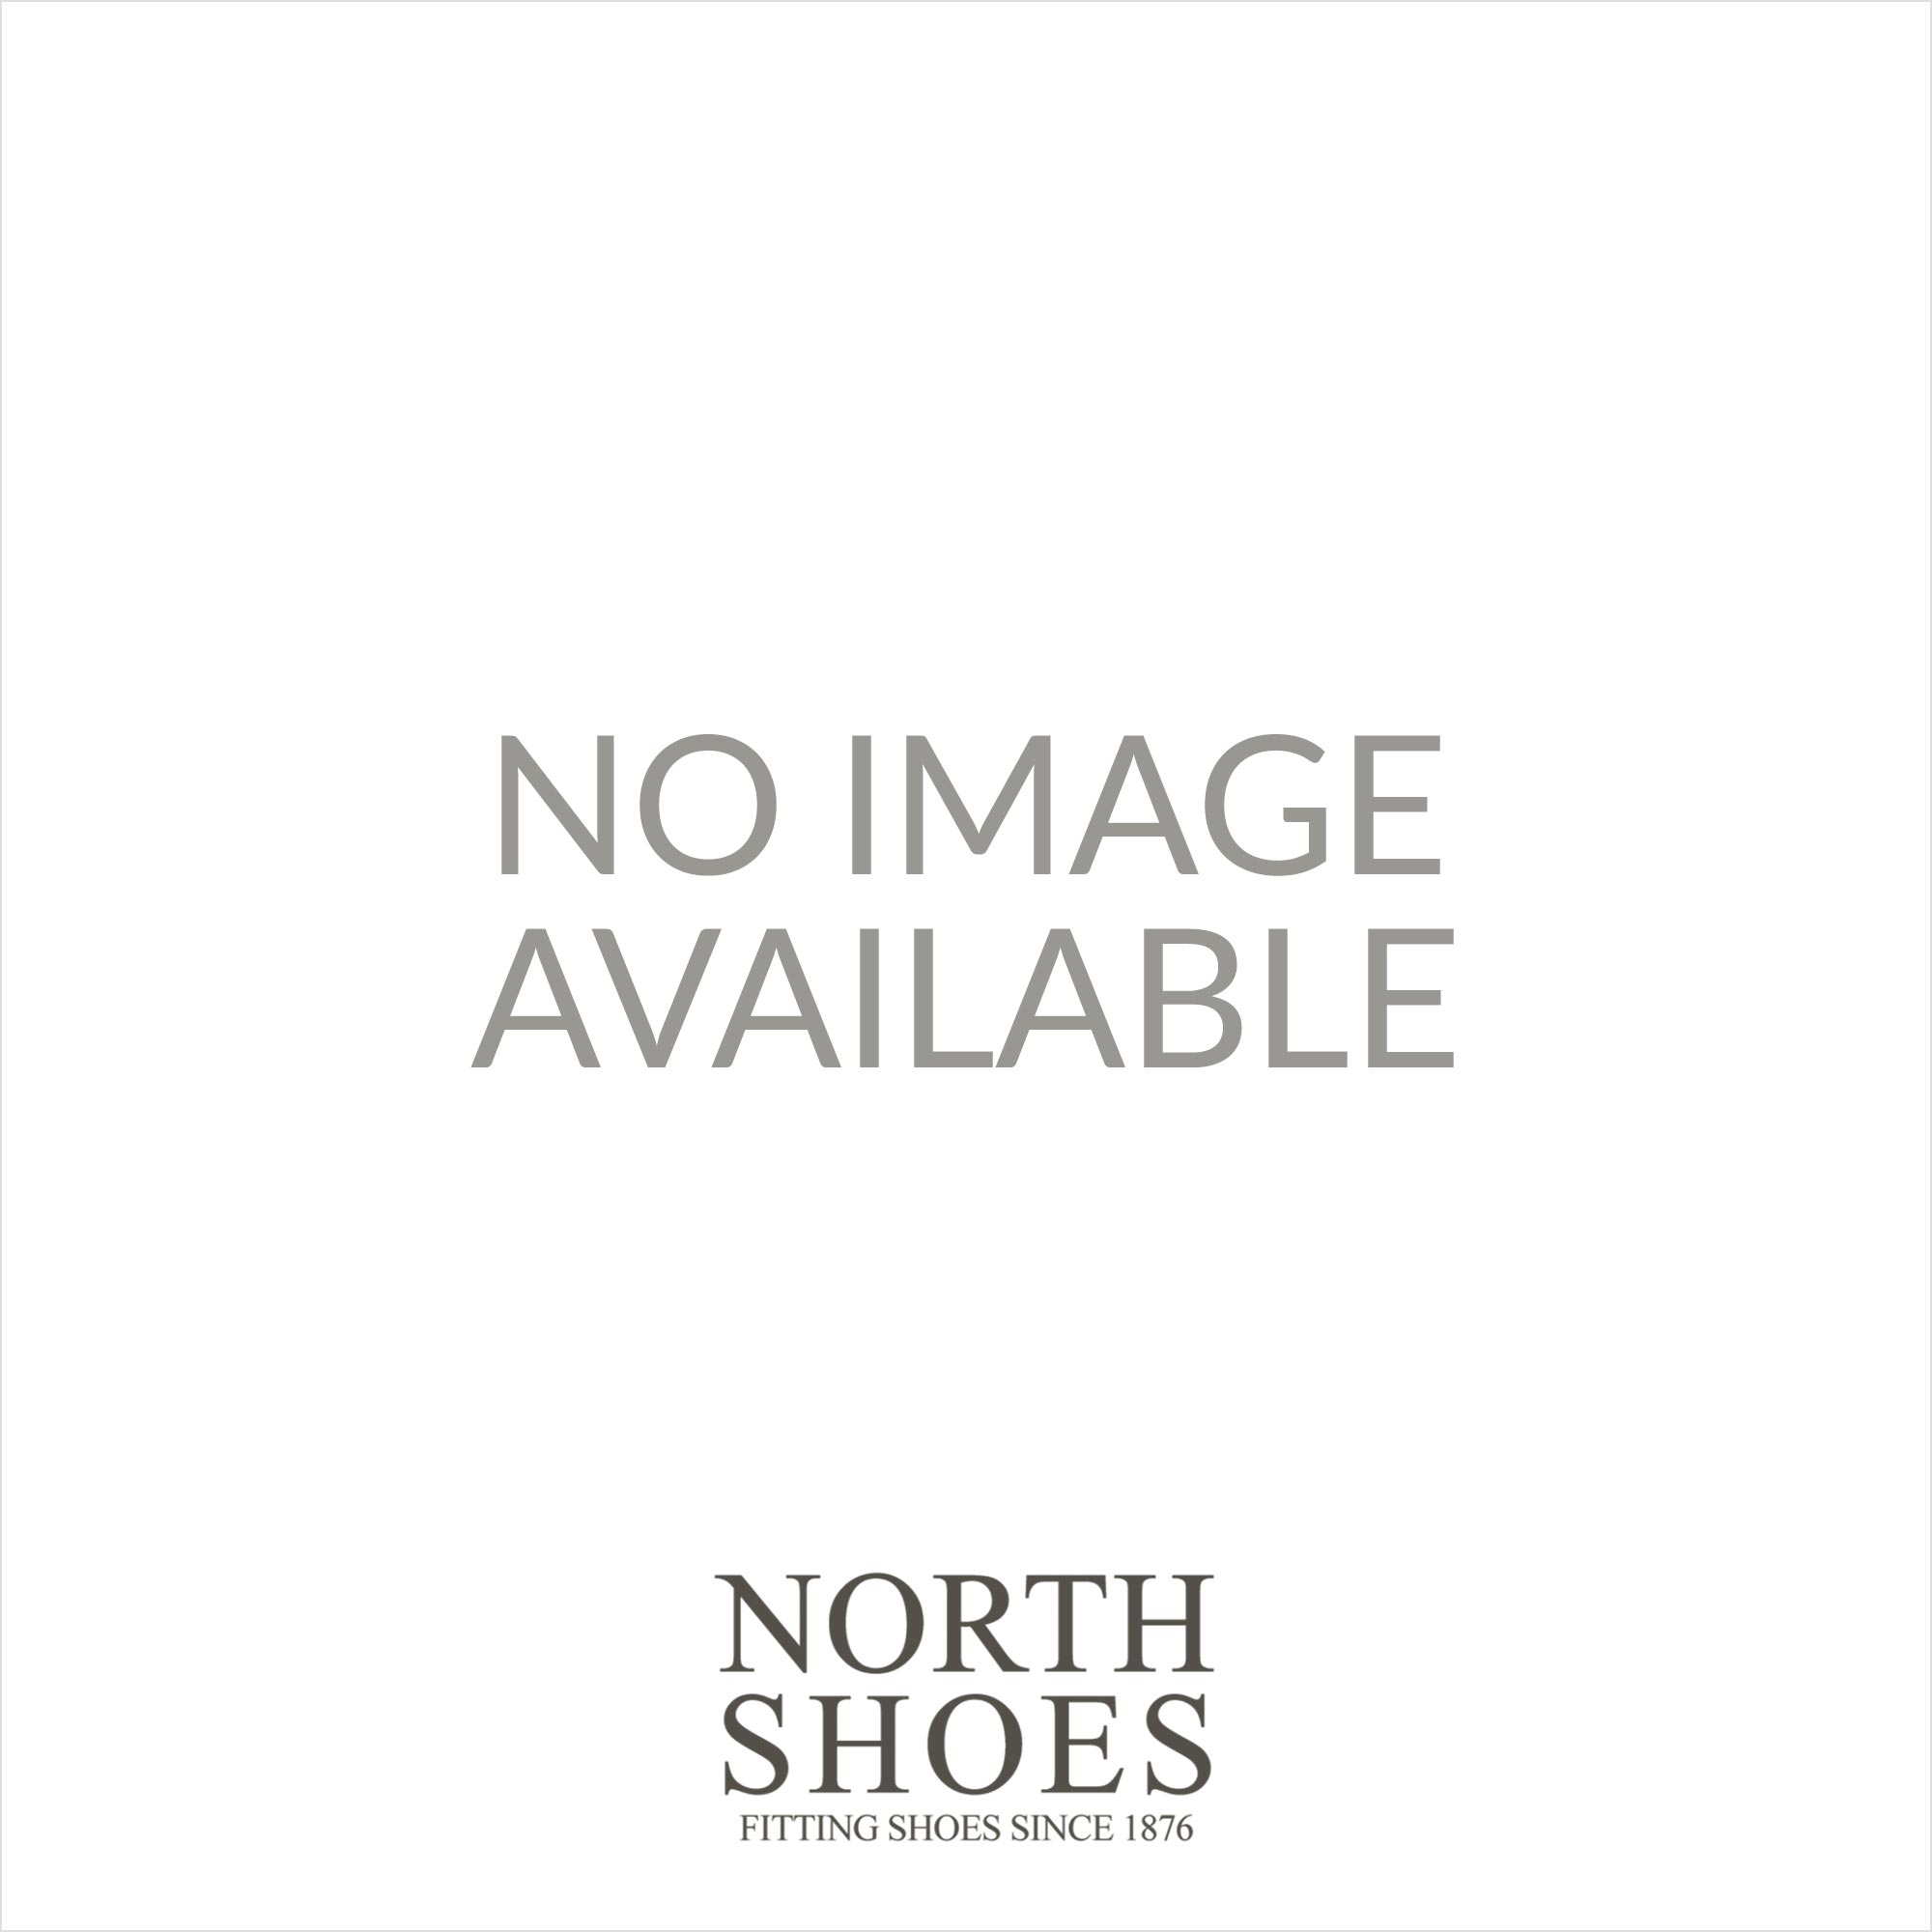 CONVERSE 159525C Silver Womens Shoe